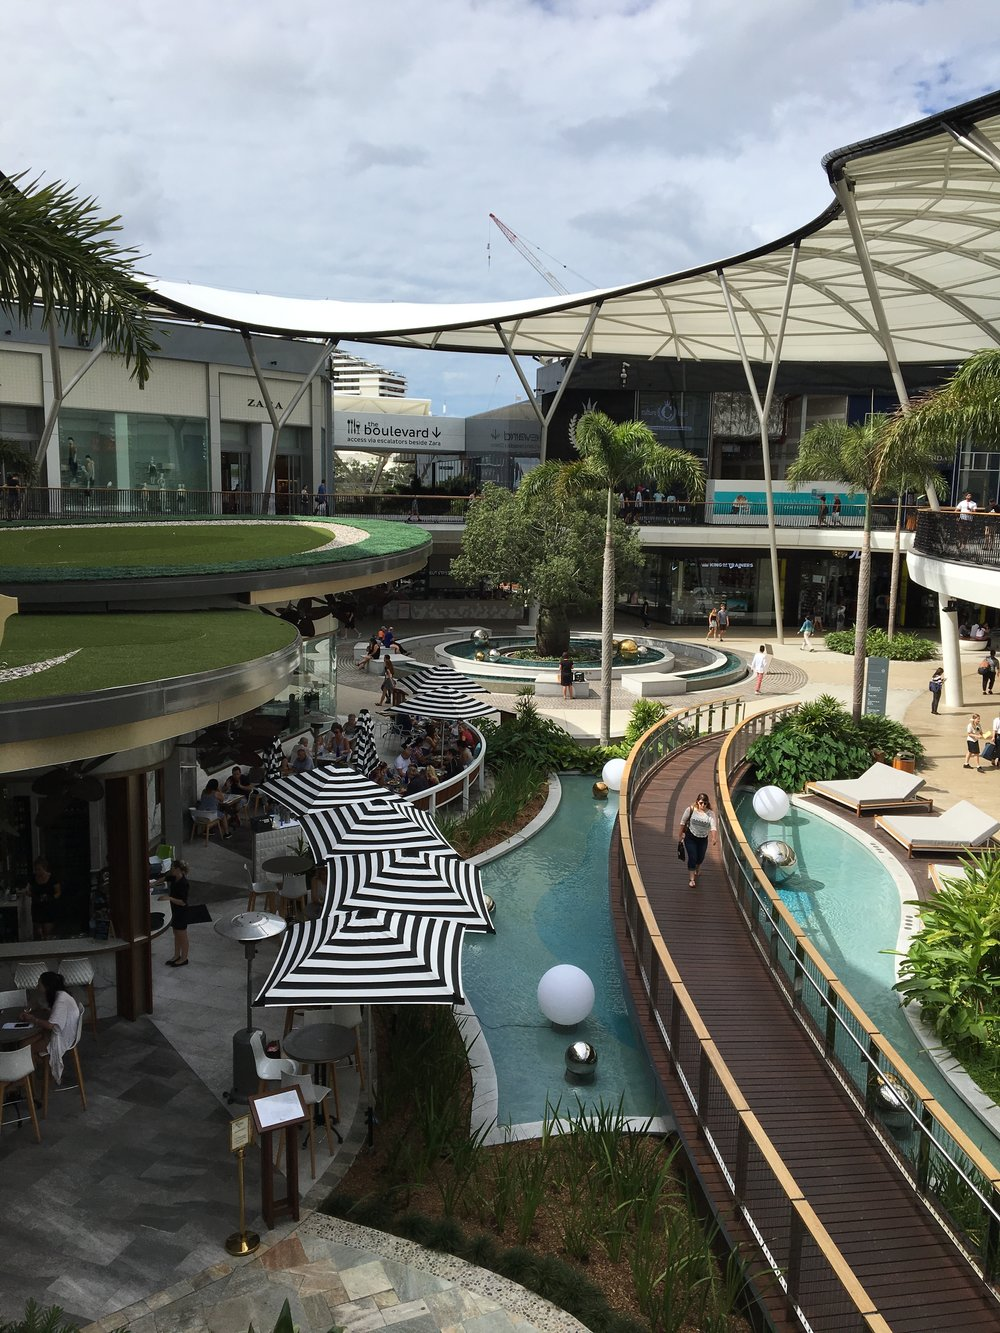 australia-gold-coast-shopping-mall.JPG